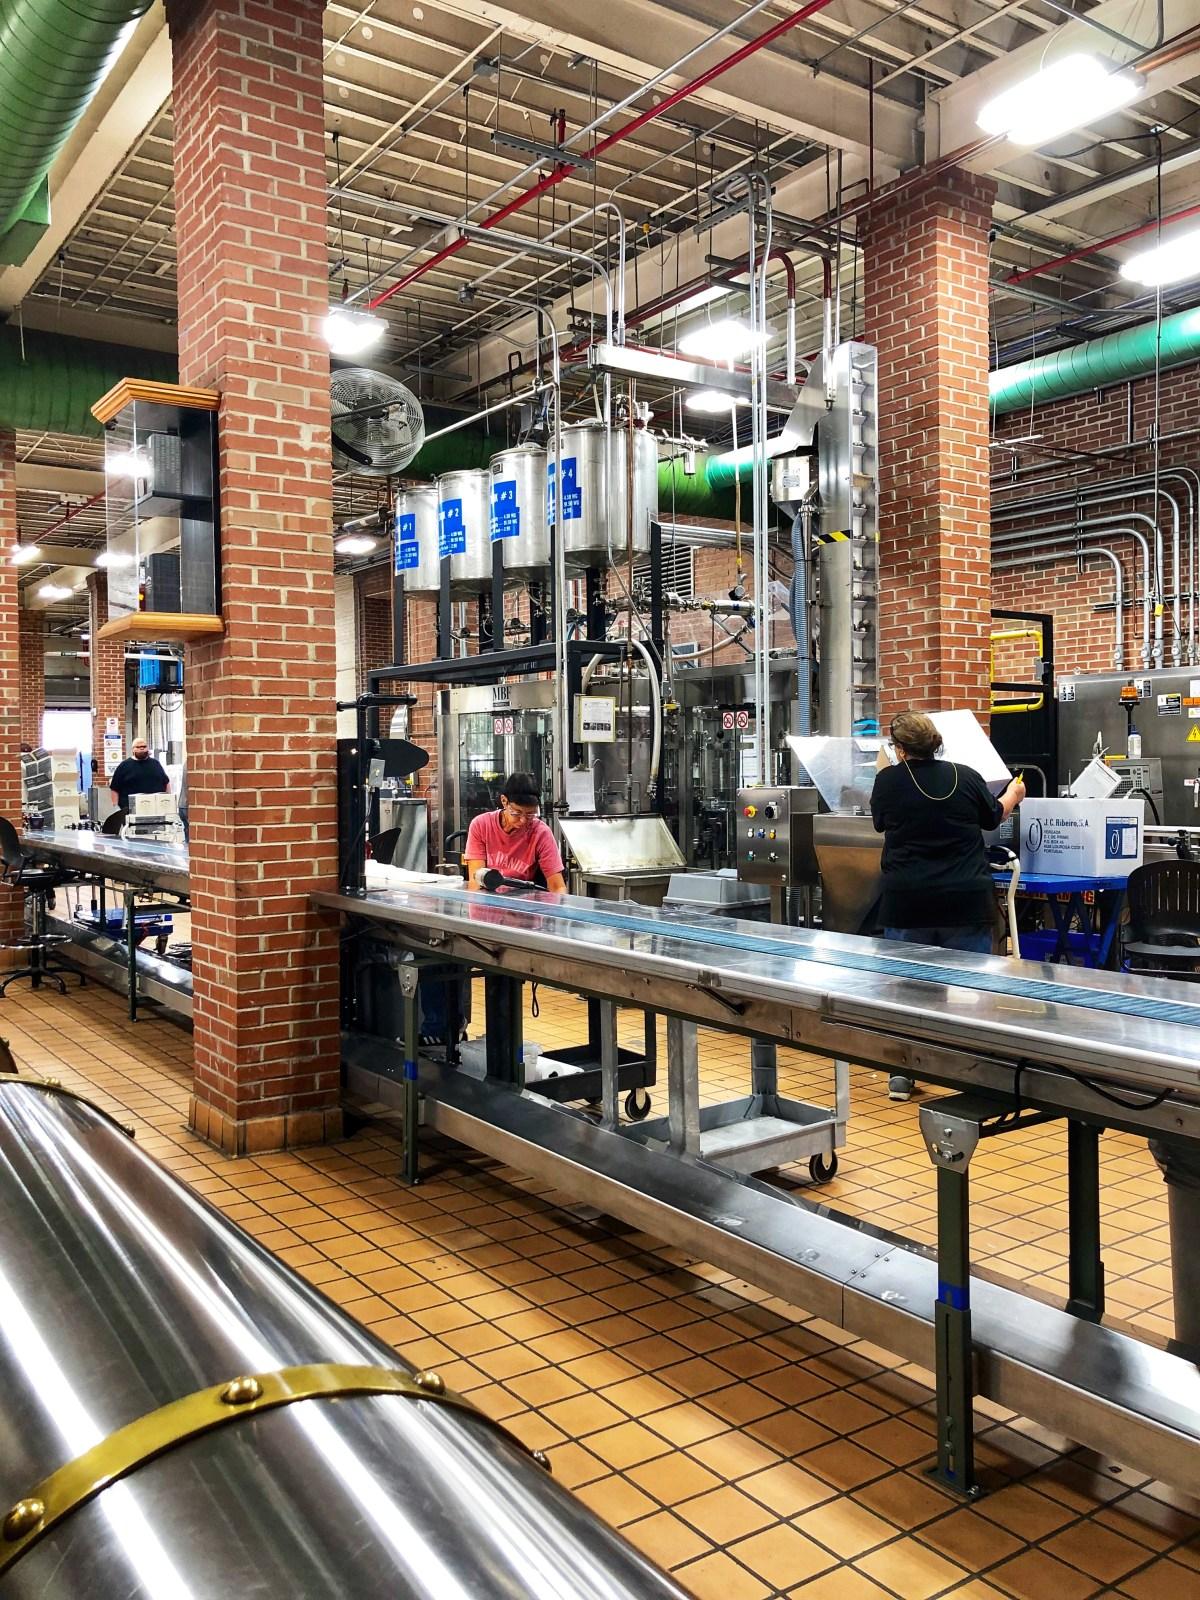 Jack Daniels Distillery #travel #lynchburg #jackdaniels #howjackdanielsismade #jackdanielstour